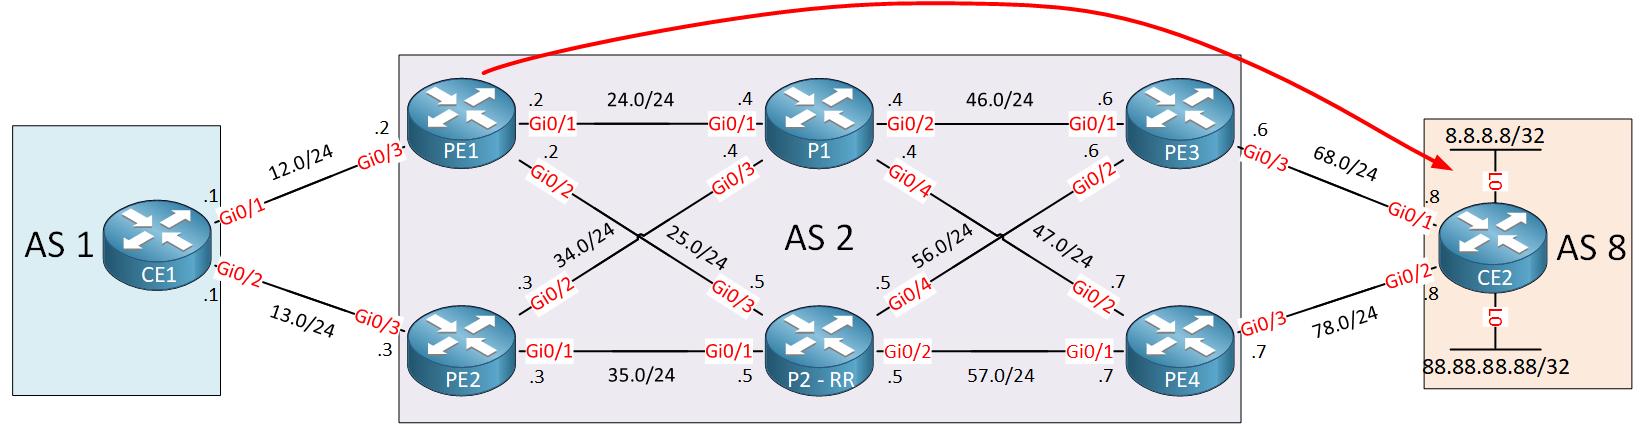 Bgp Pic Core Traffic Path Pe1 Ce2